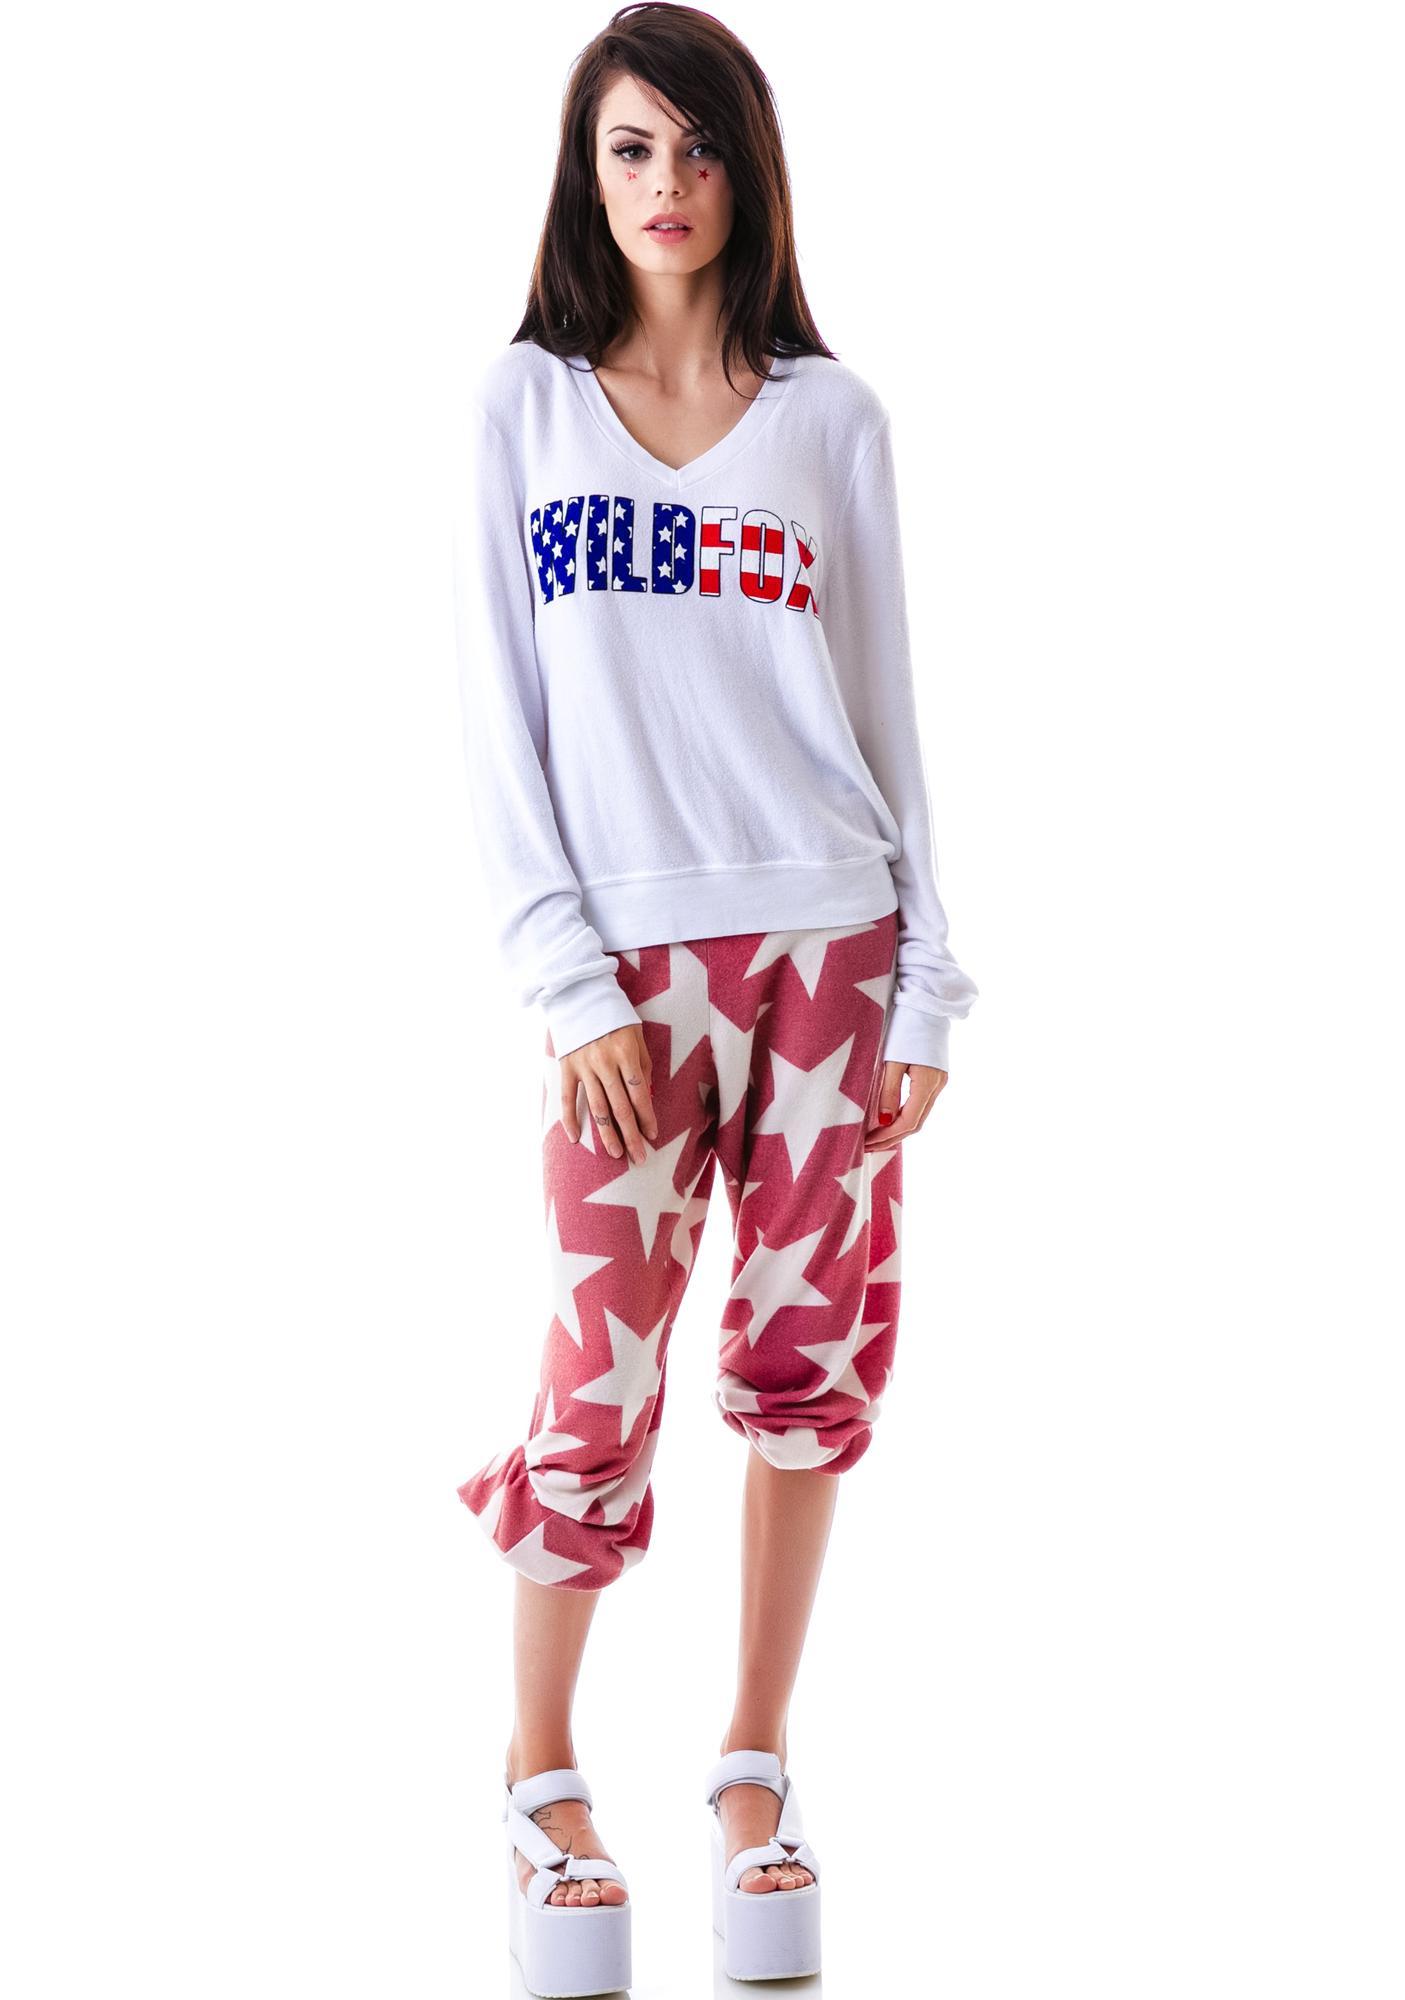 Wildfox Couture American Fox V-Neck Baggy Beach Jumper